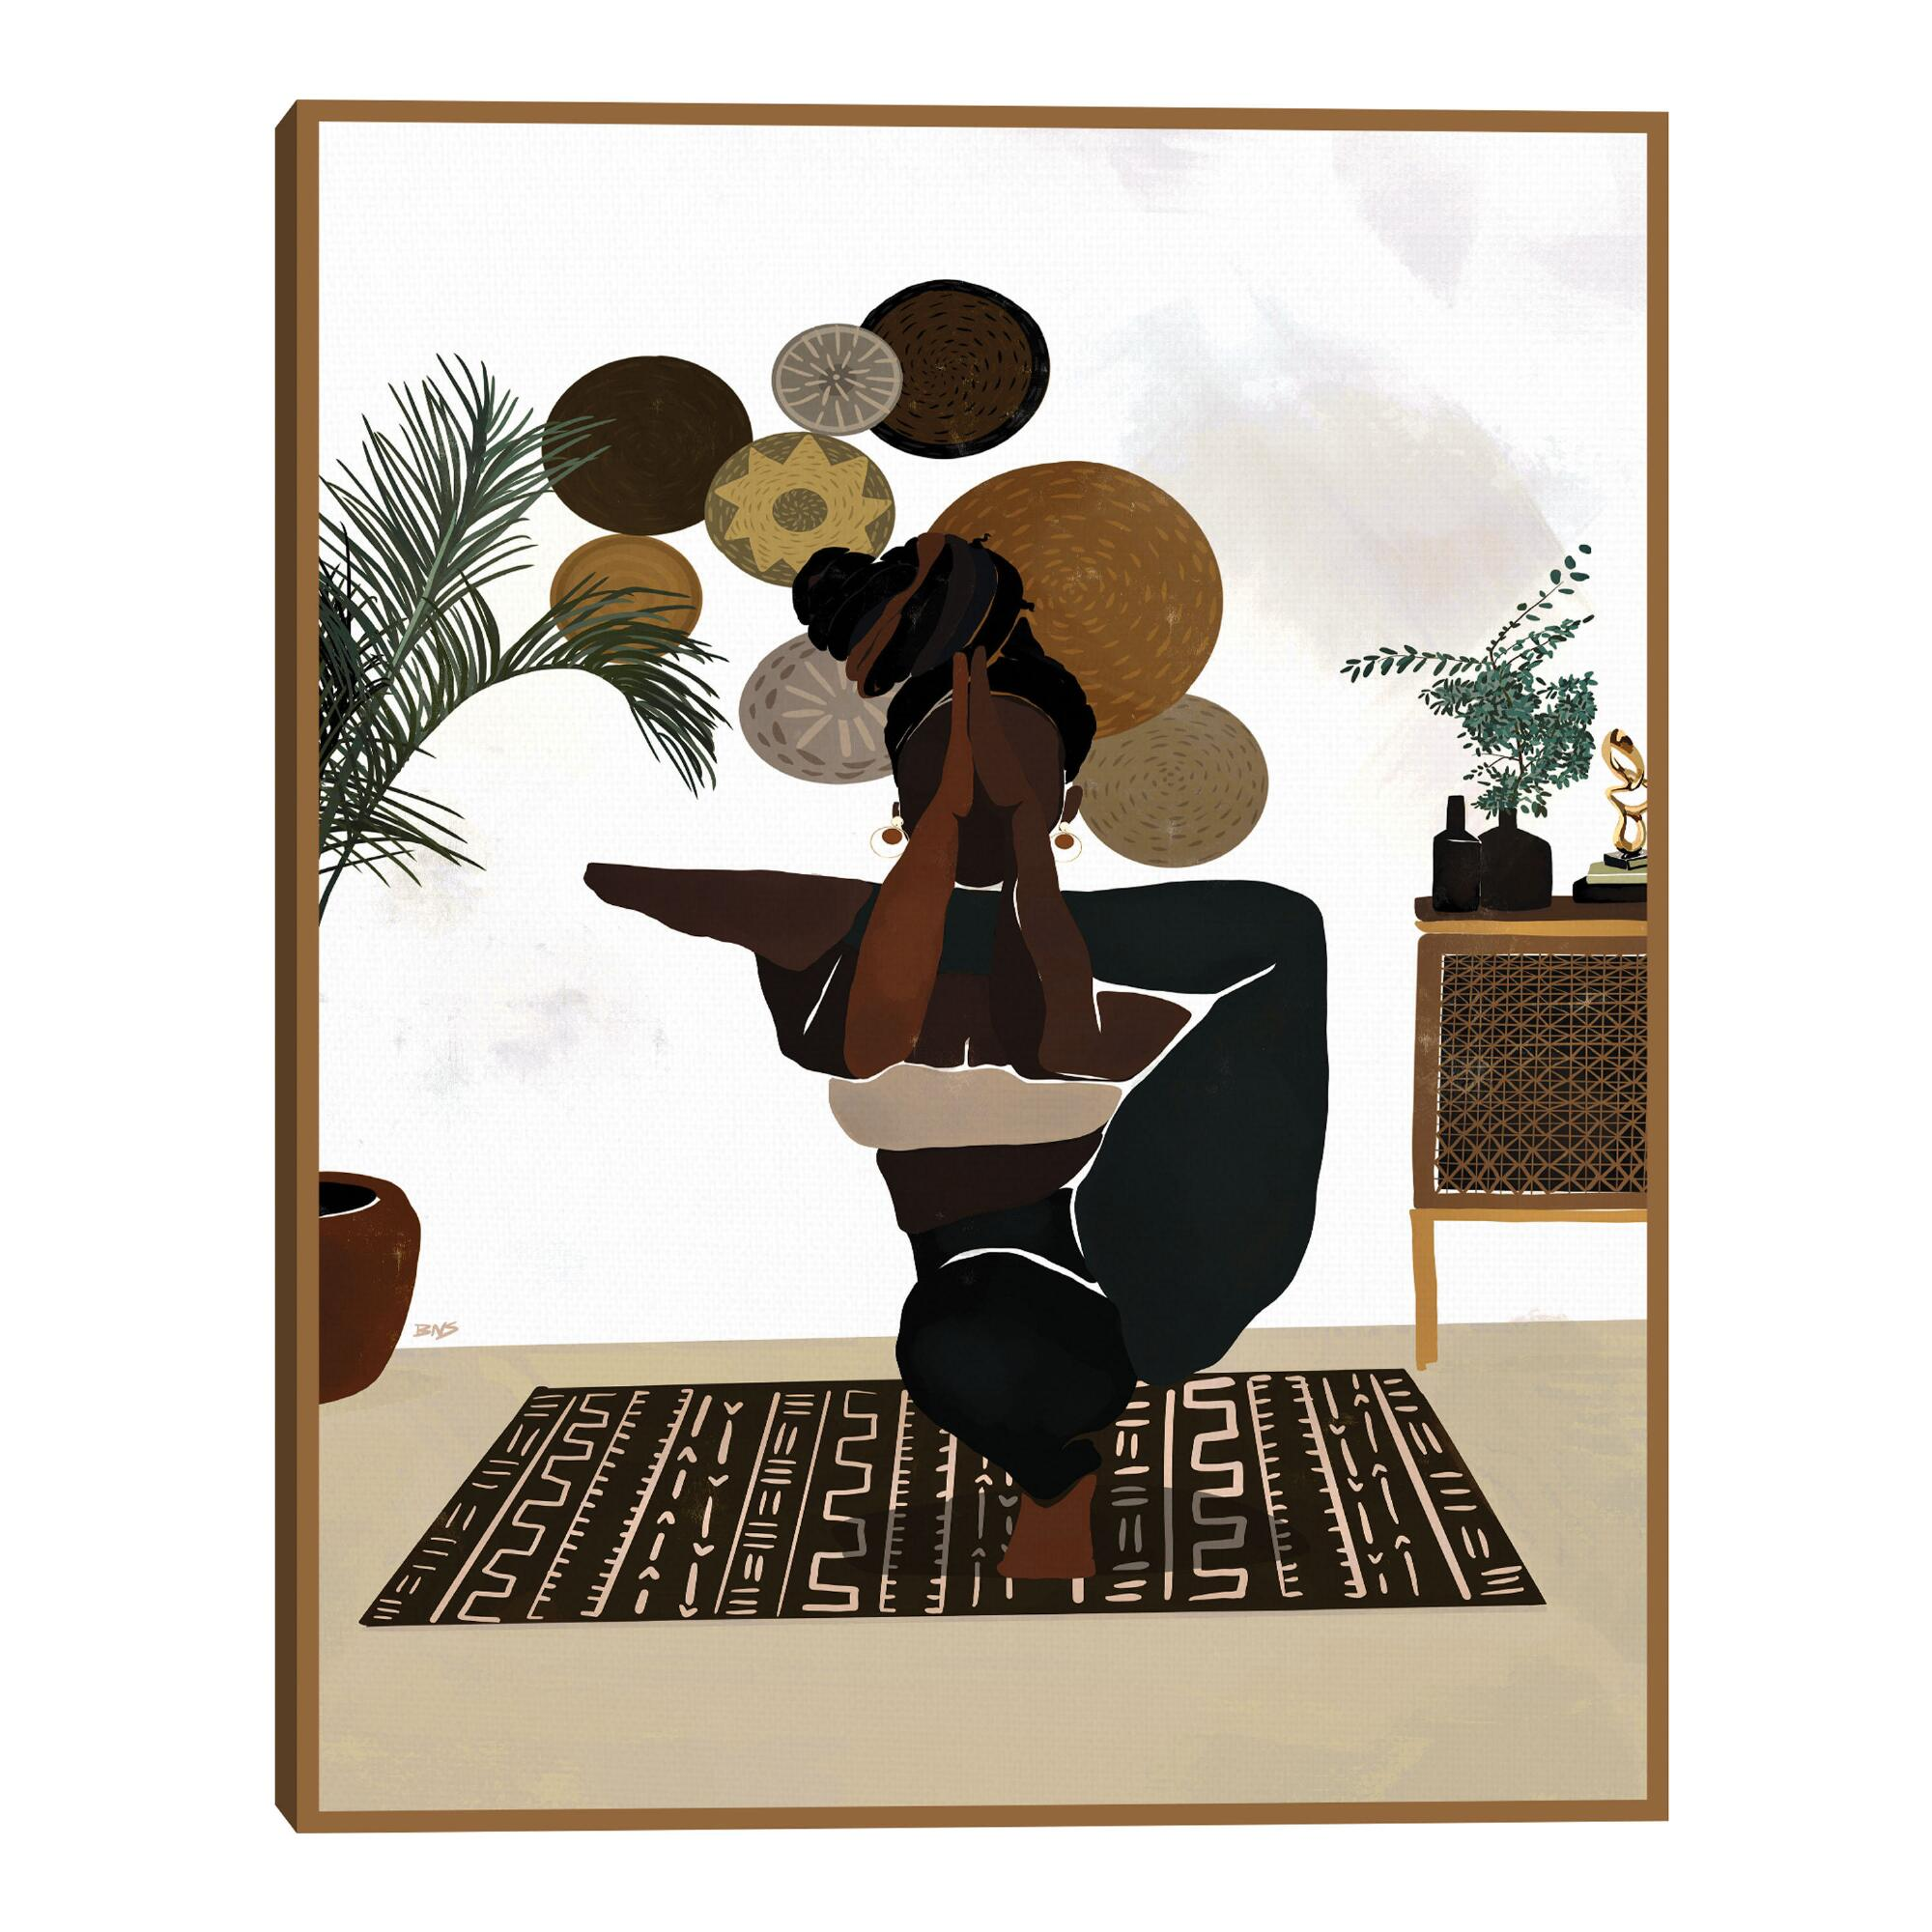 Balance By Bria Nicole Framed Canvas Wall Art $79.99